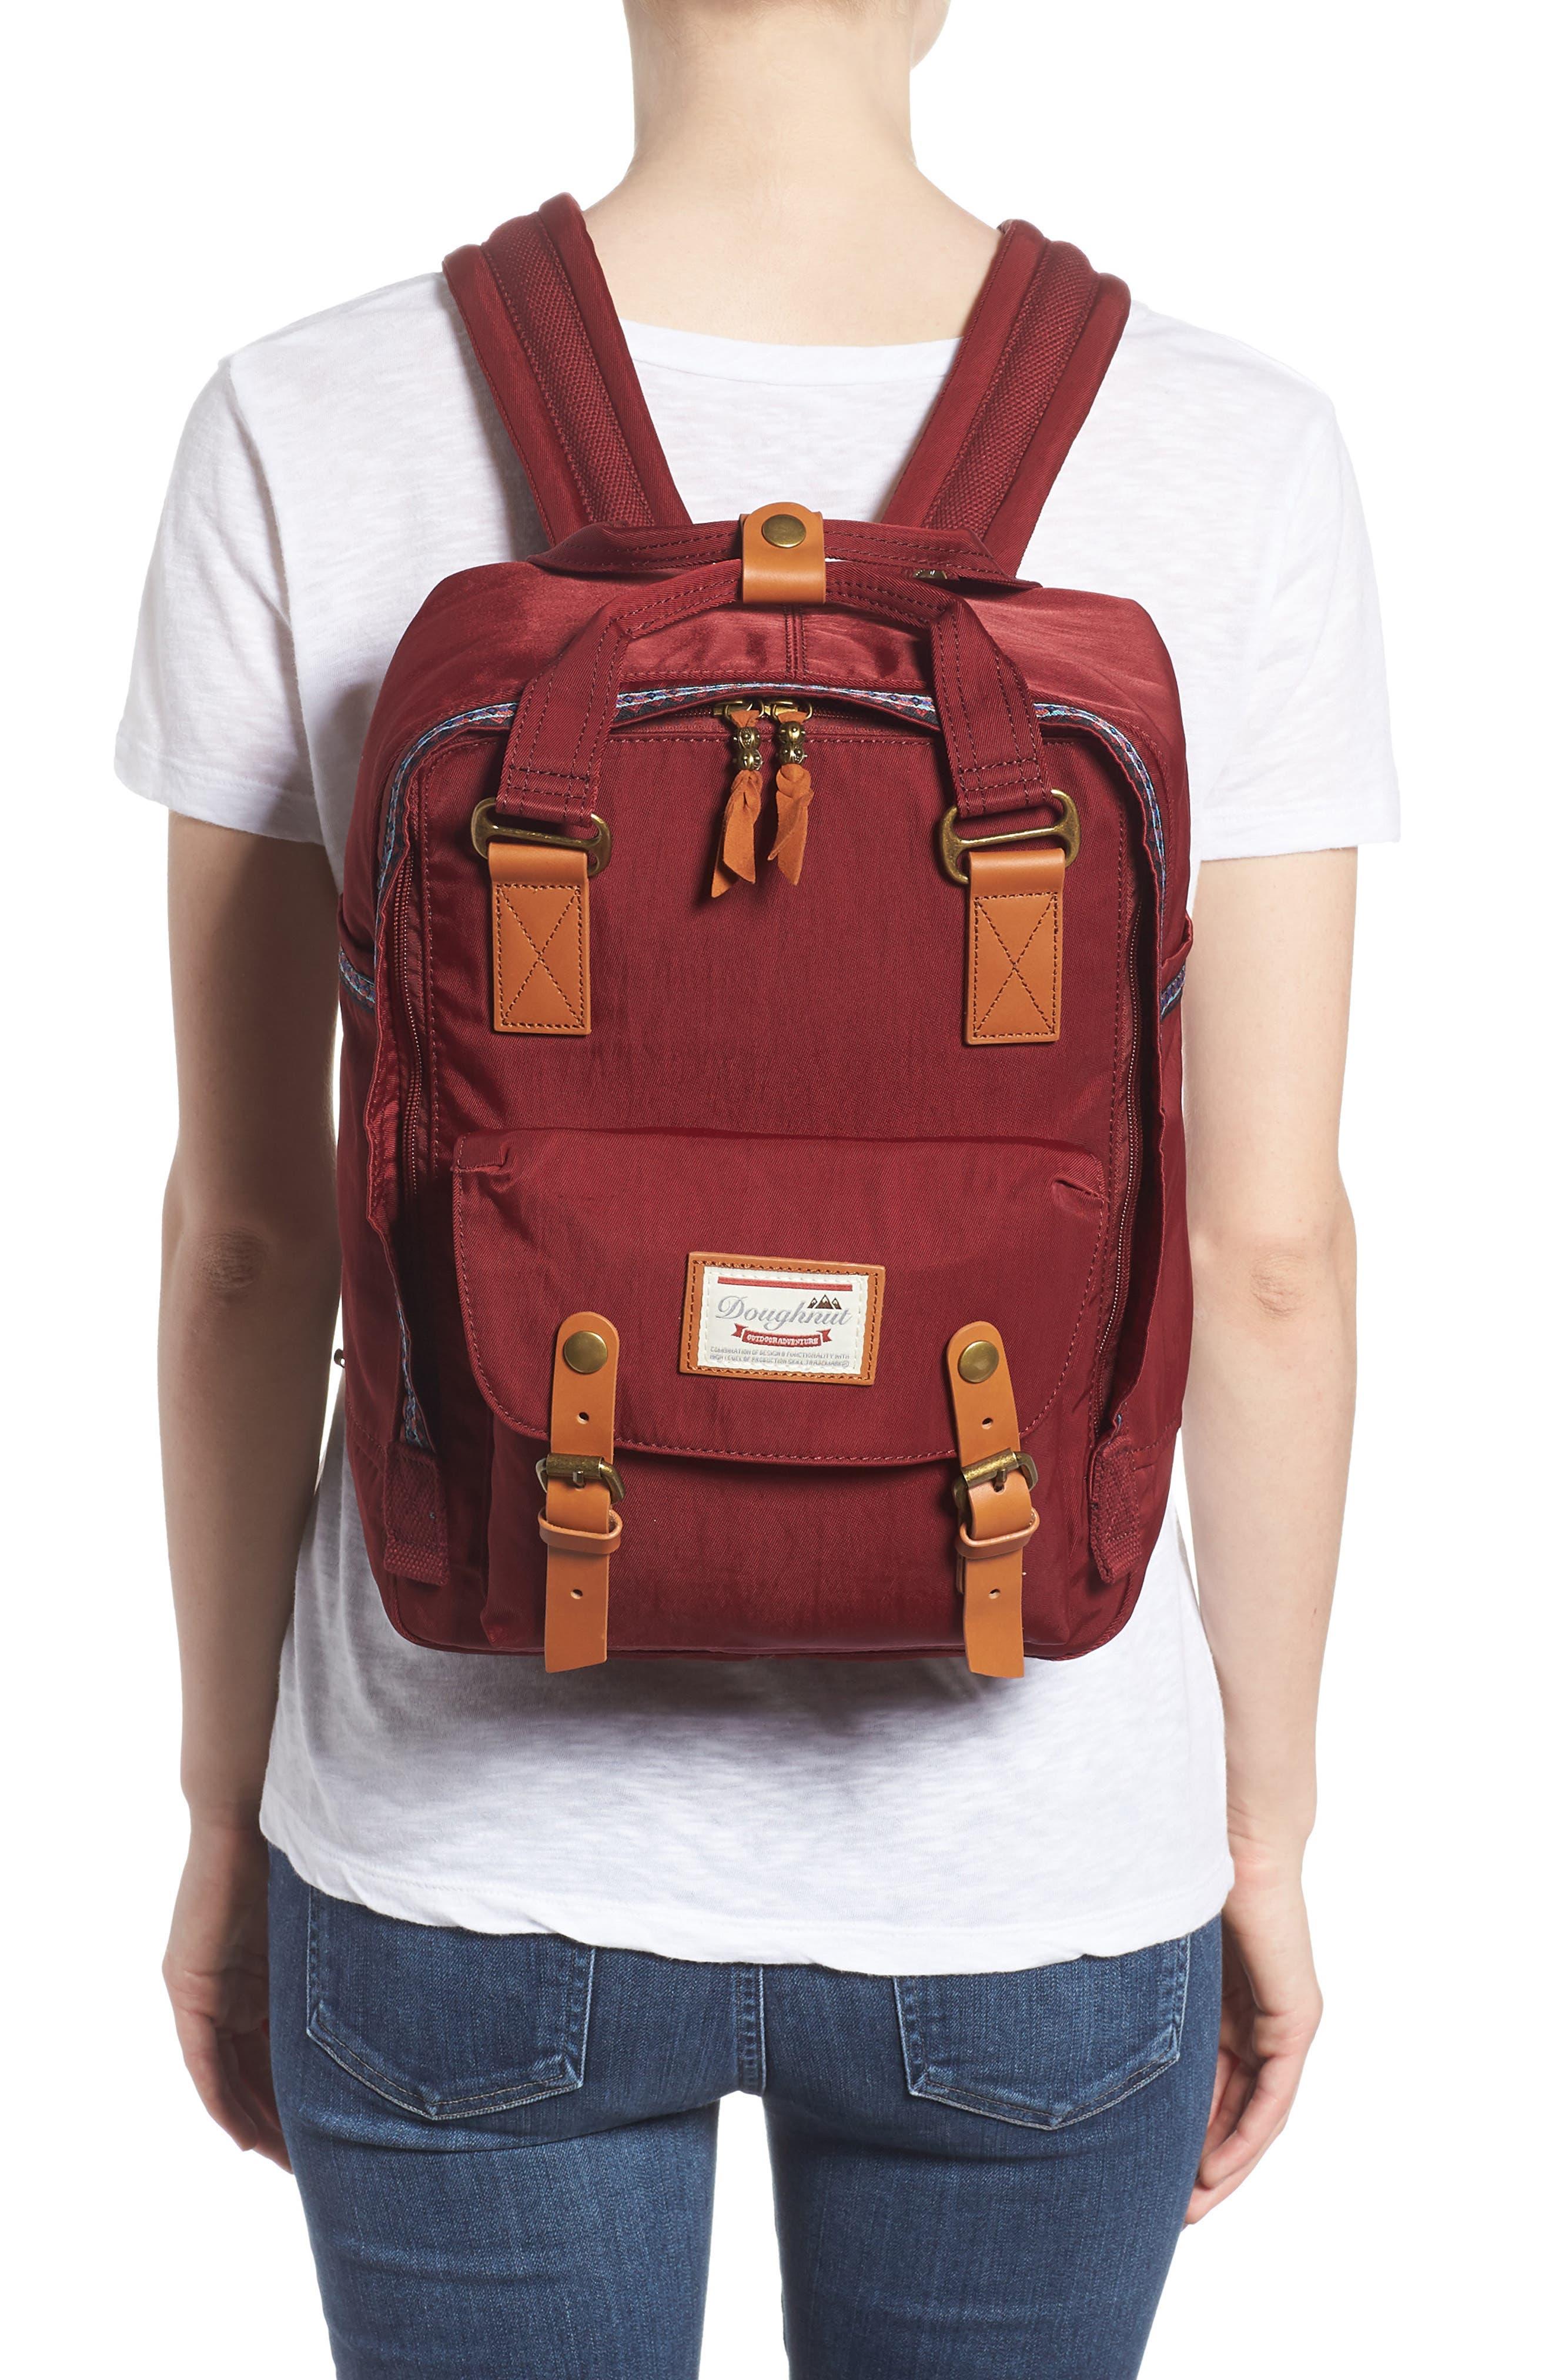 Macaroon Bo-He Water Resistant Backpack,                             Alternate thumbnail 2, color,                             Wine